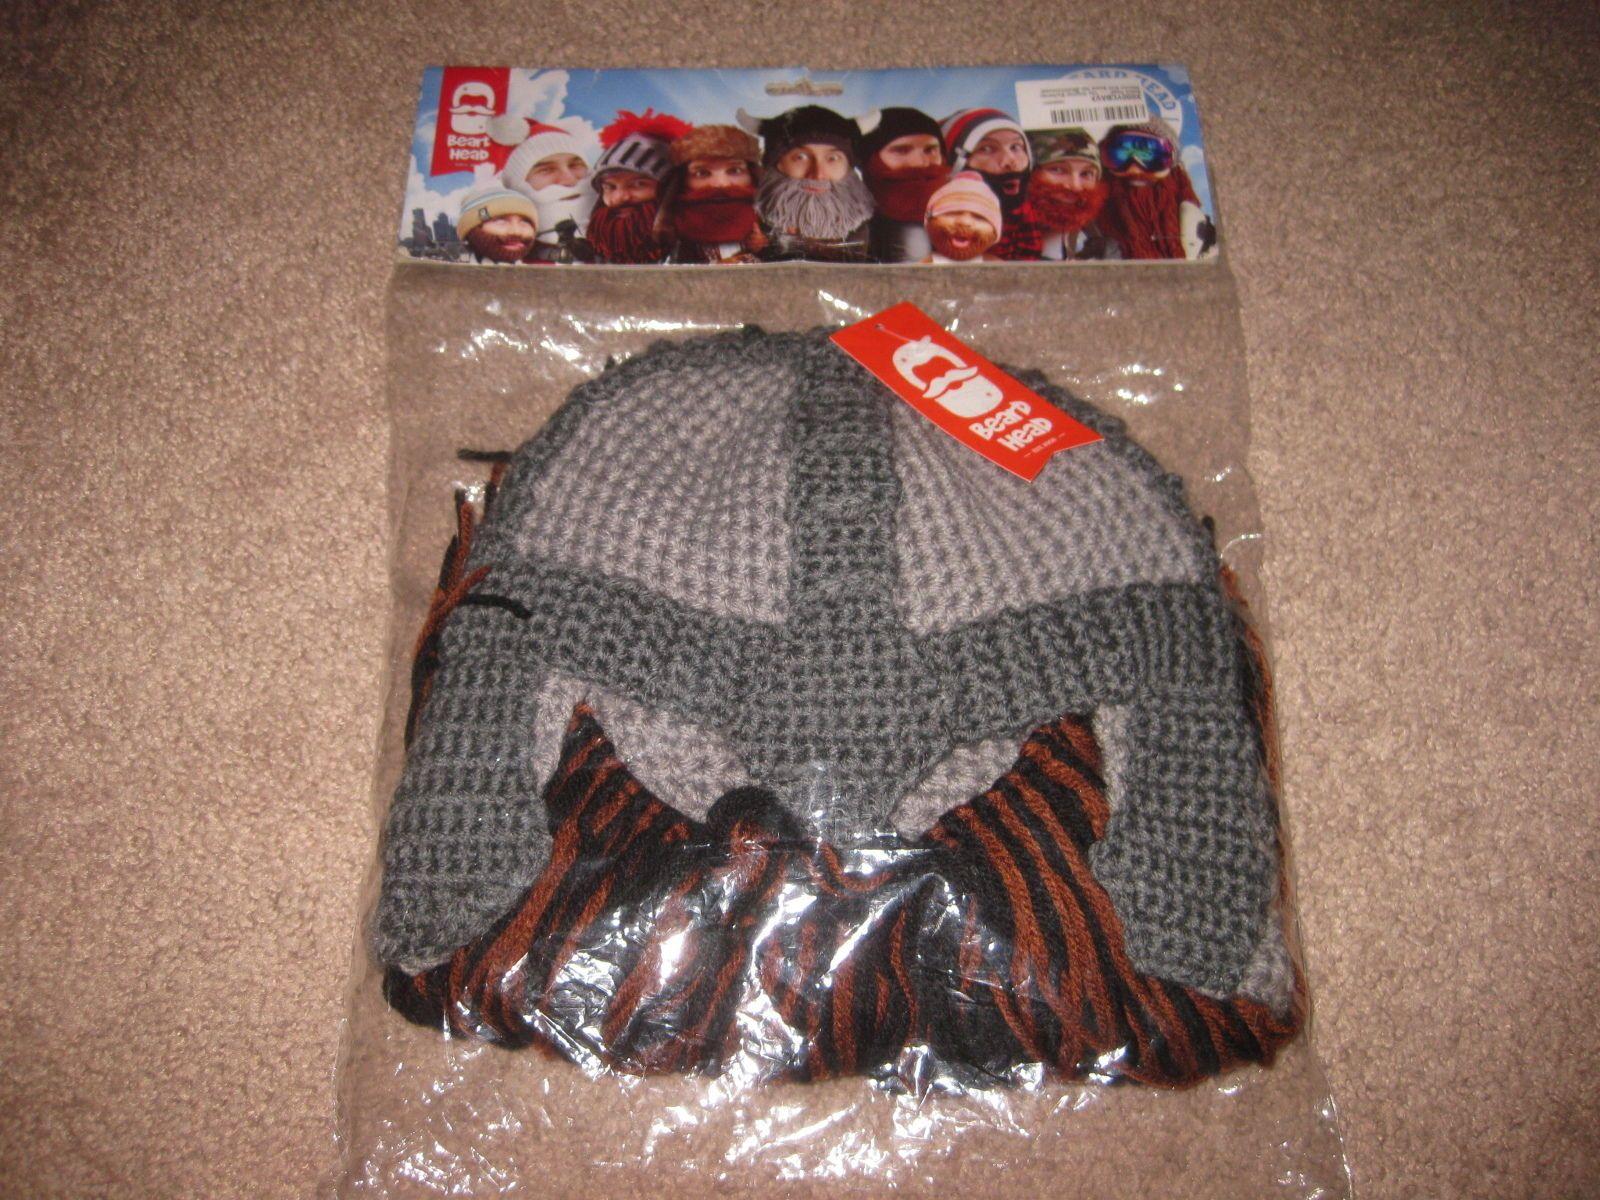 8ddbff75013 Hats and Headwear 62175  Beard Head - The Original Barbarian Warrior Knit  Beard Hat Multi